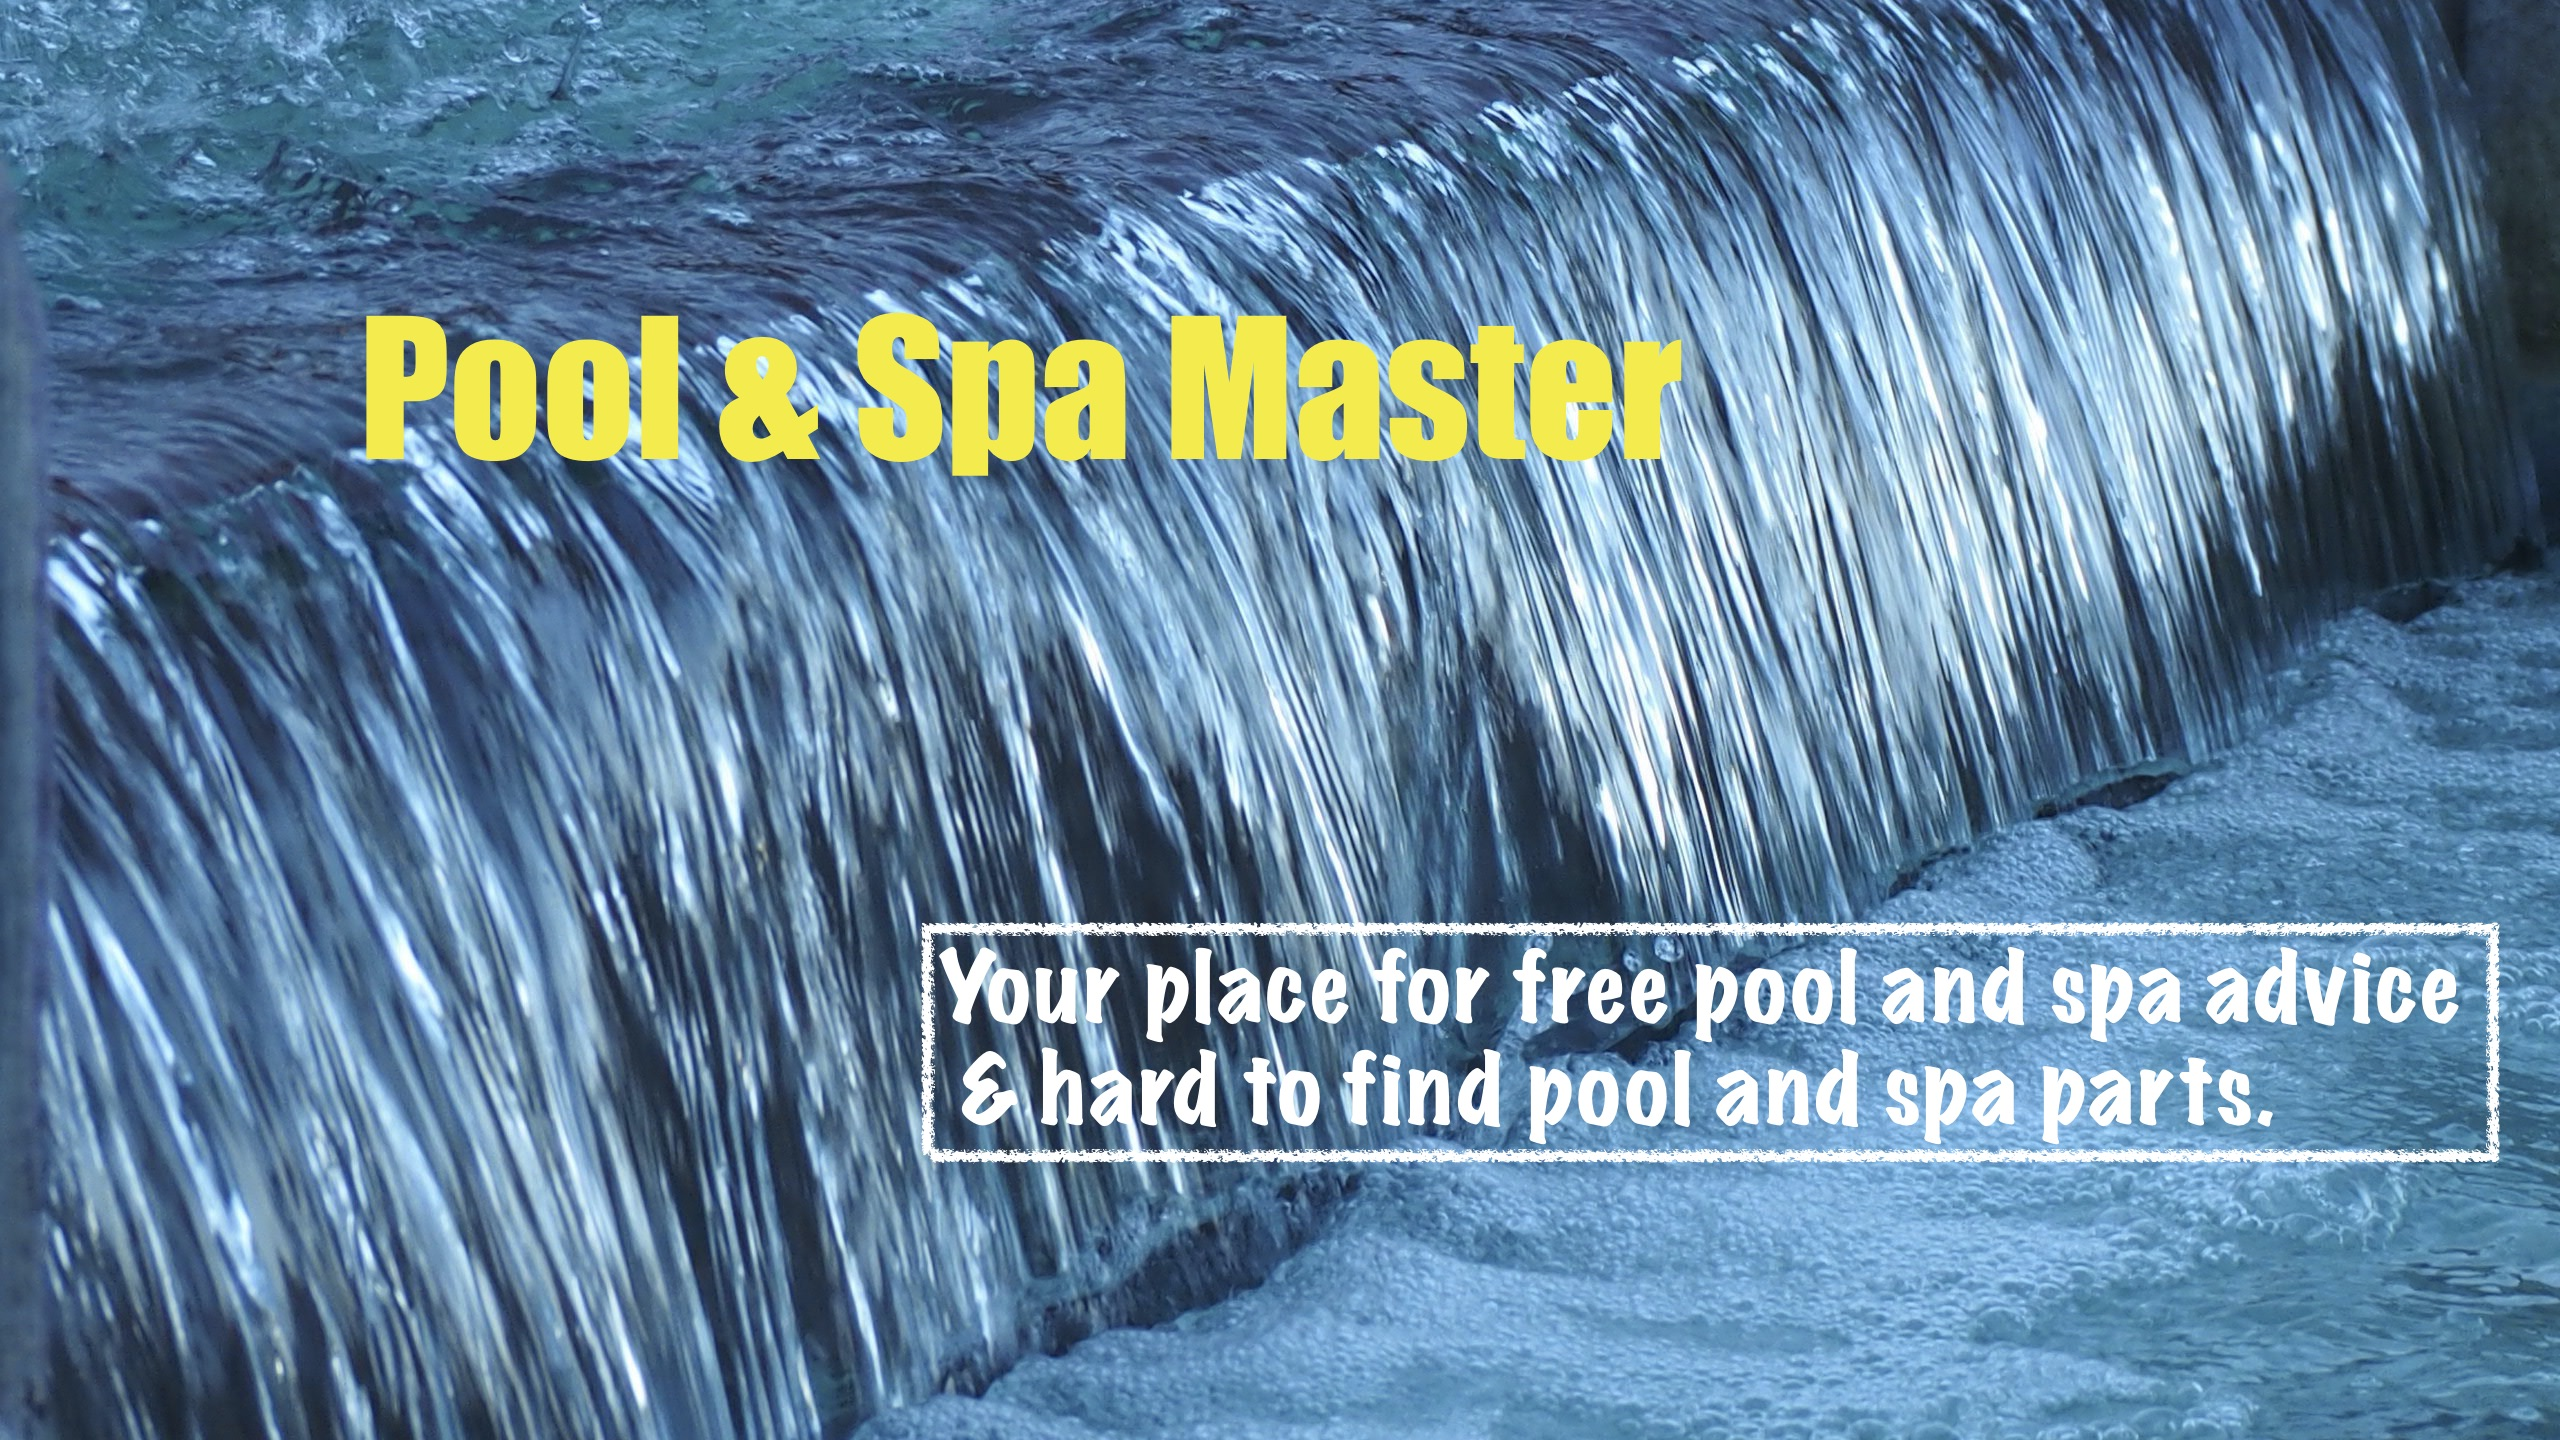 Pool & Spa Master